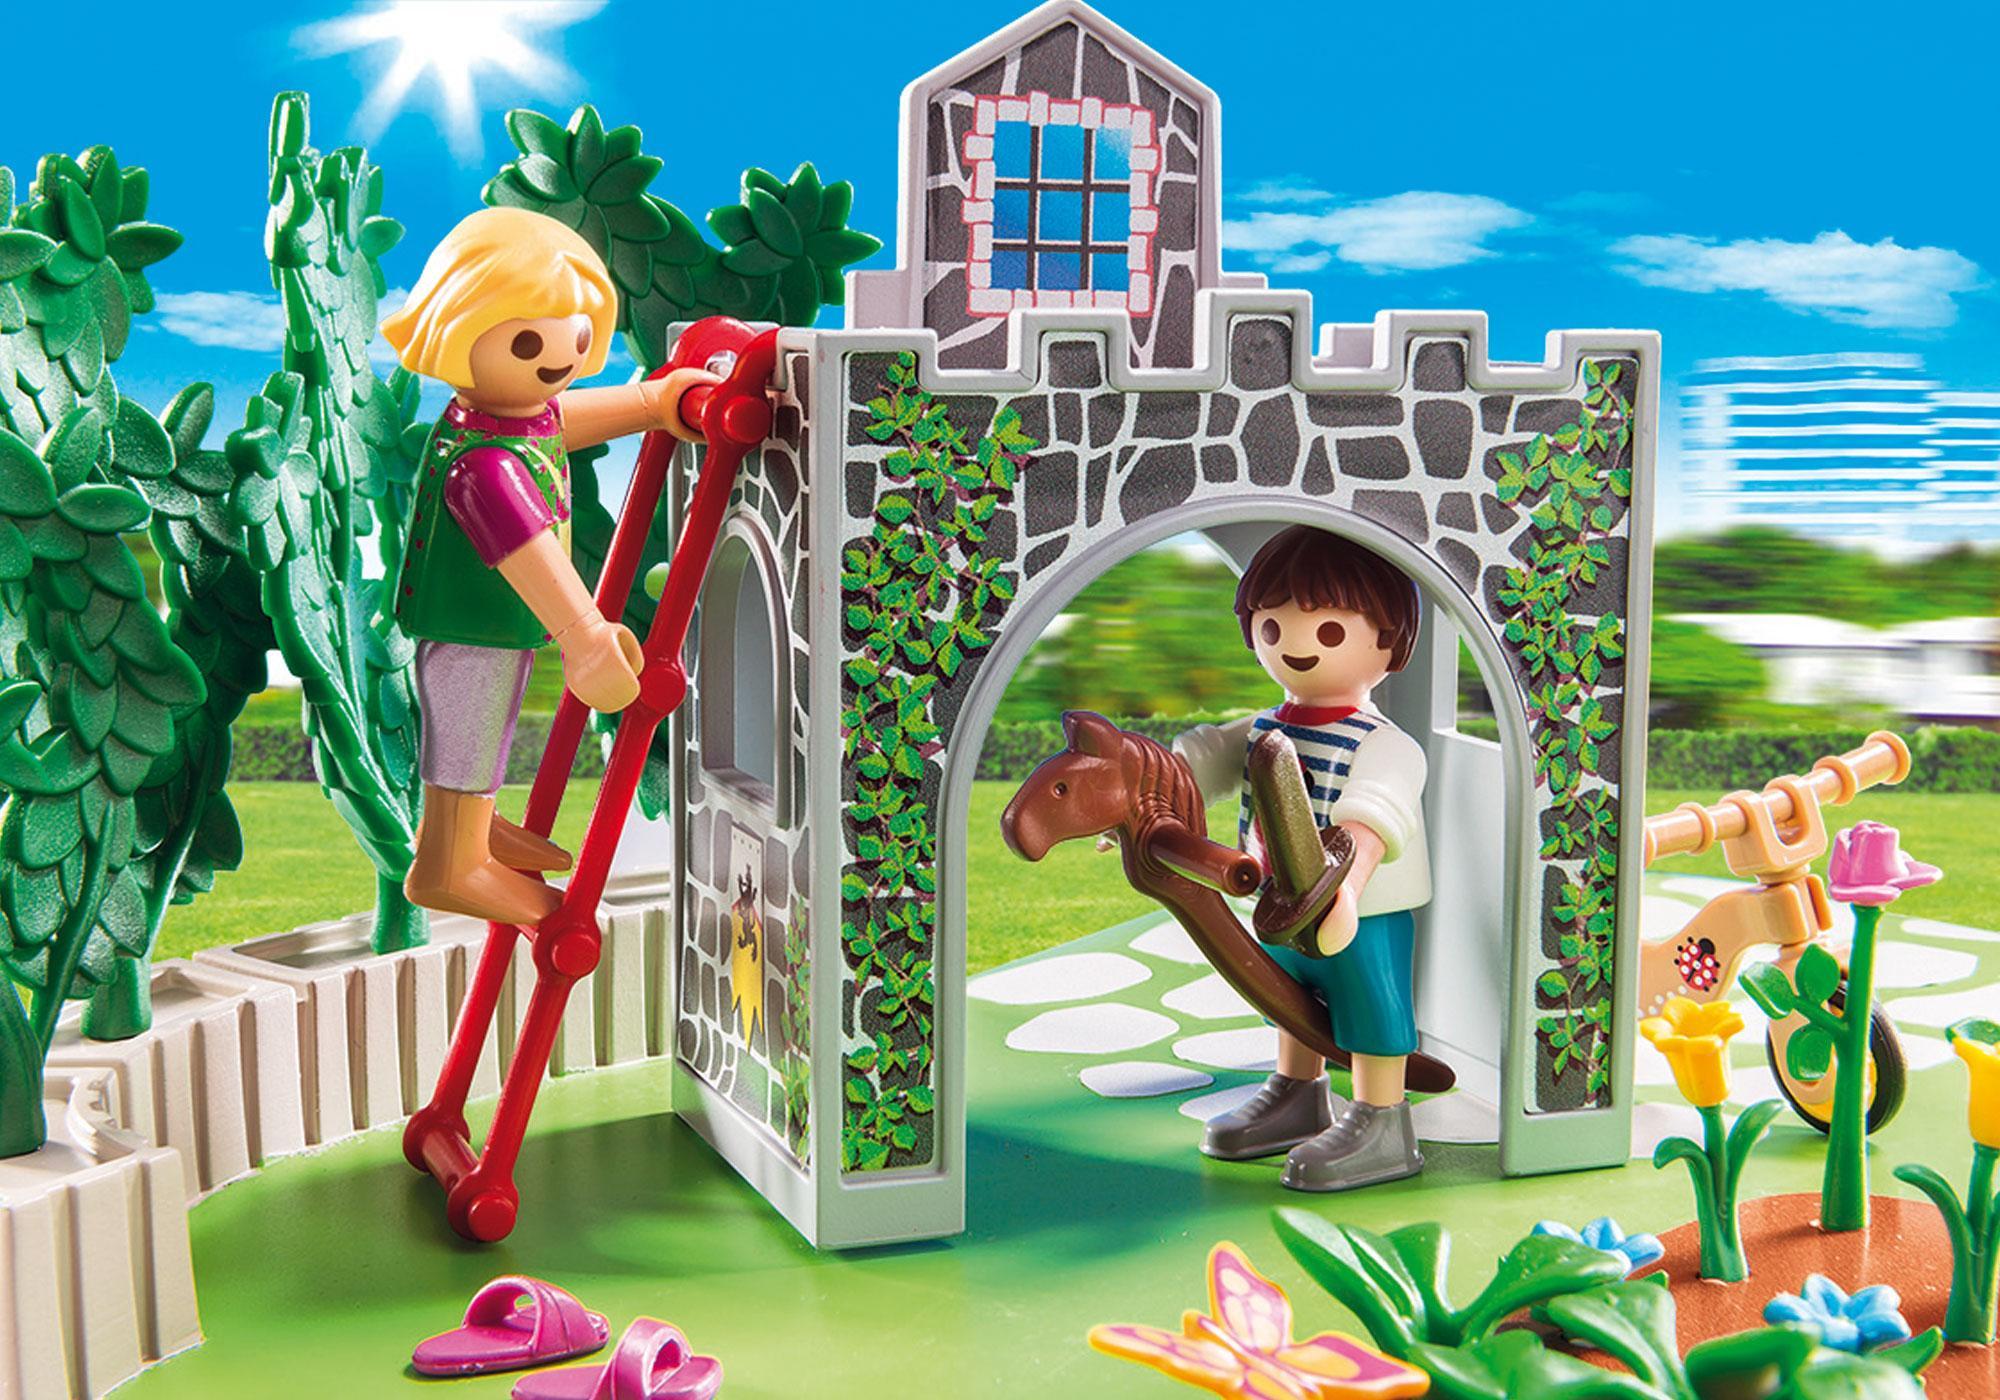 http://media.playmobil.com/i/playmobil/70010_product_extra2/SuperSet Familiengarten